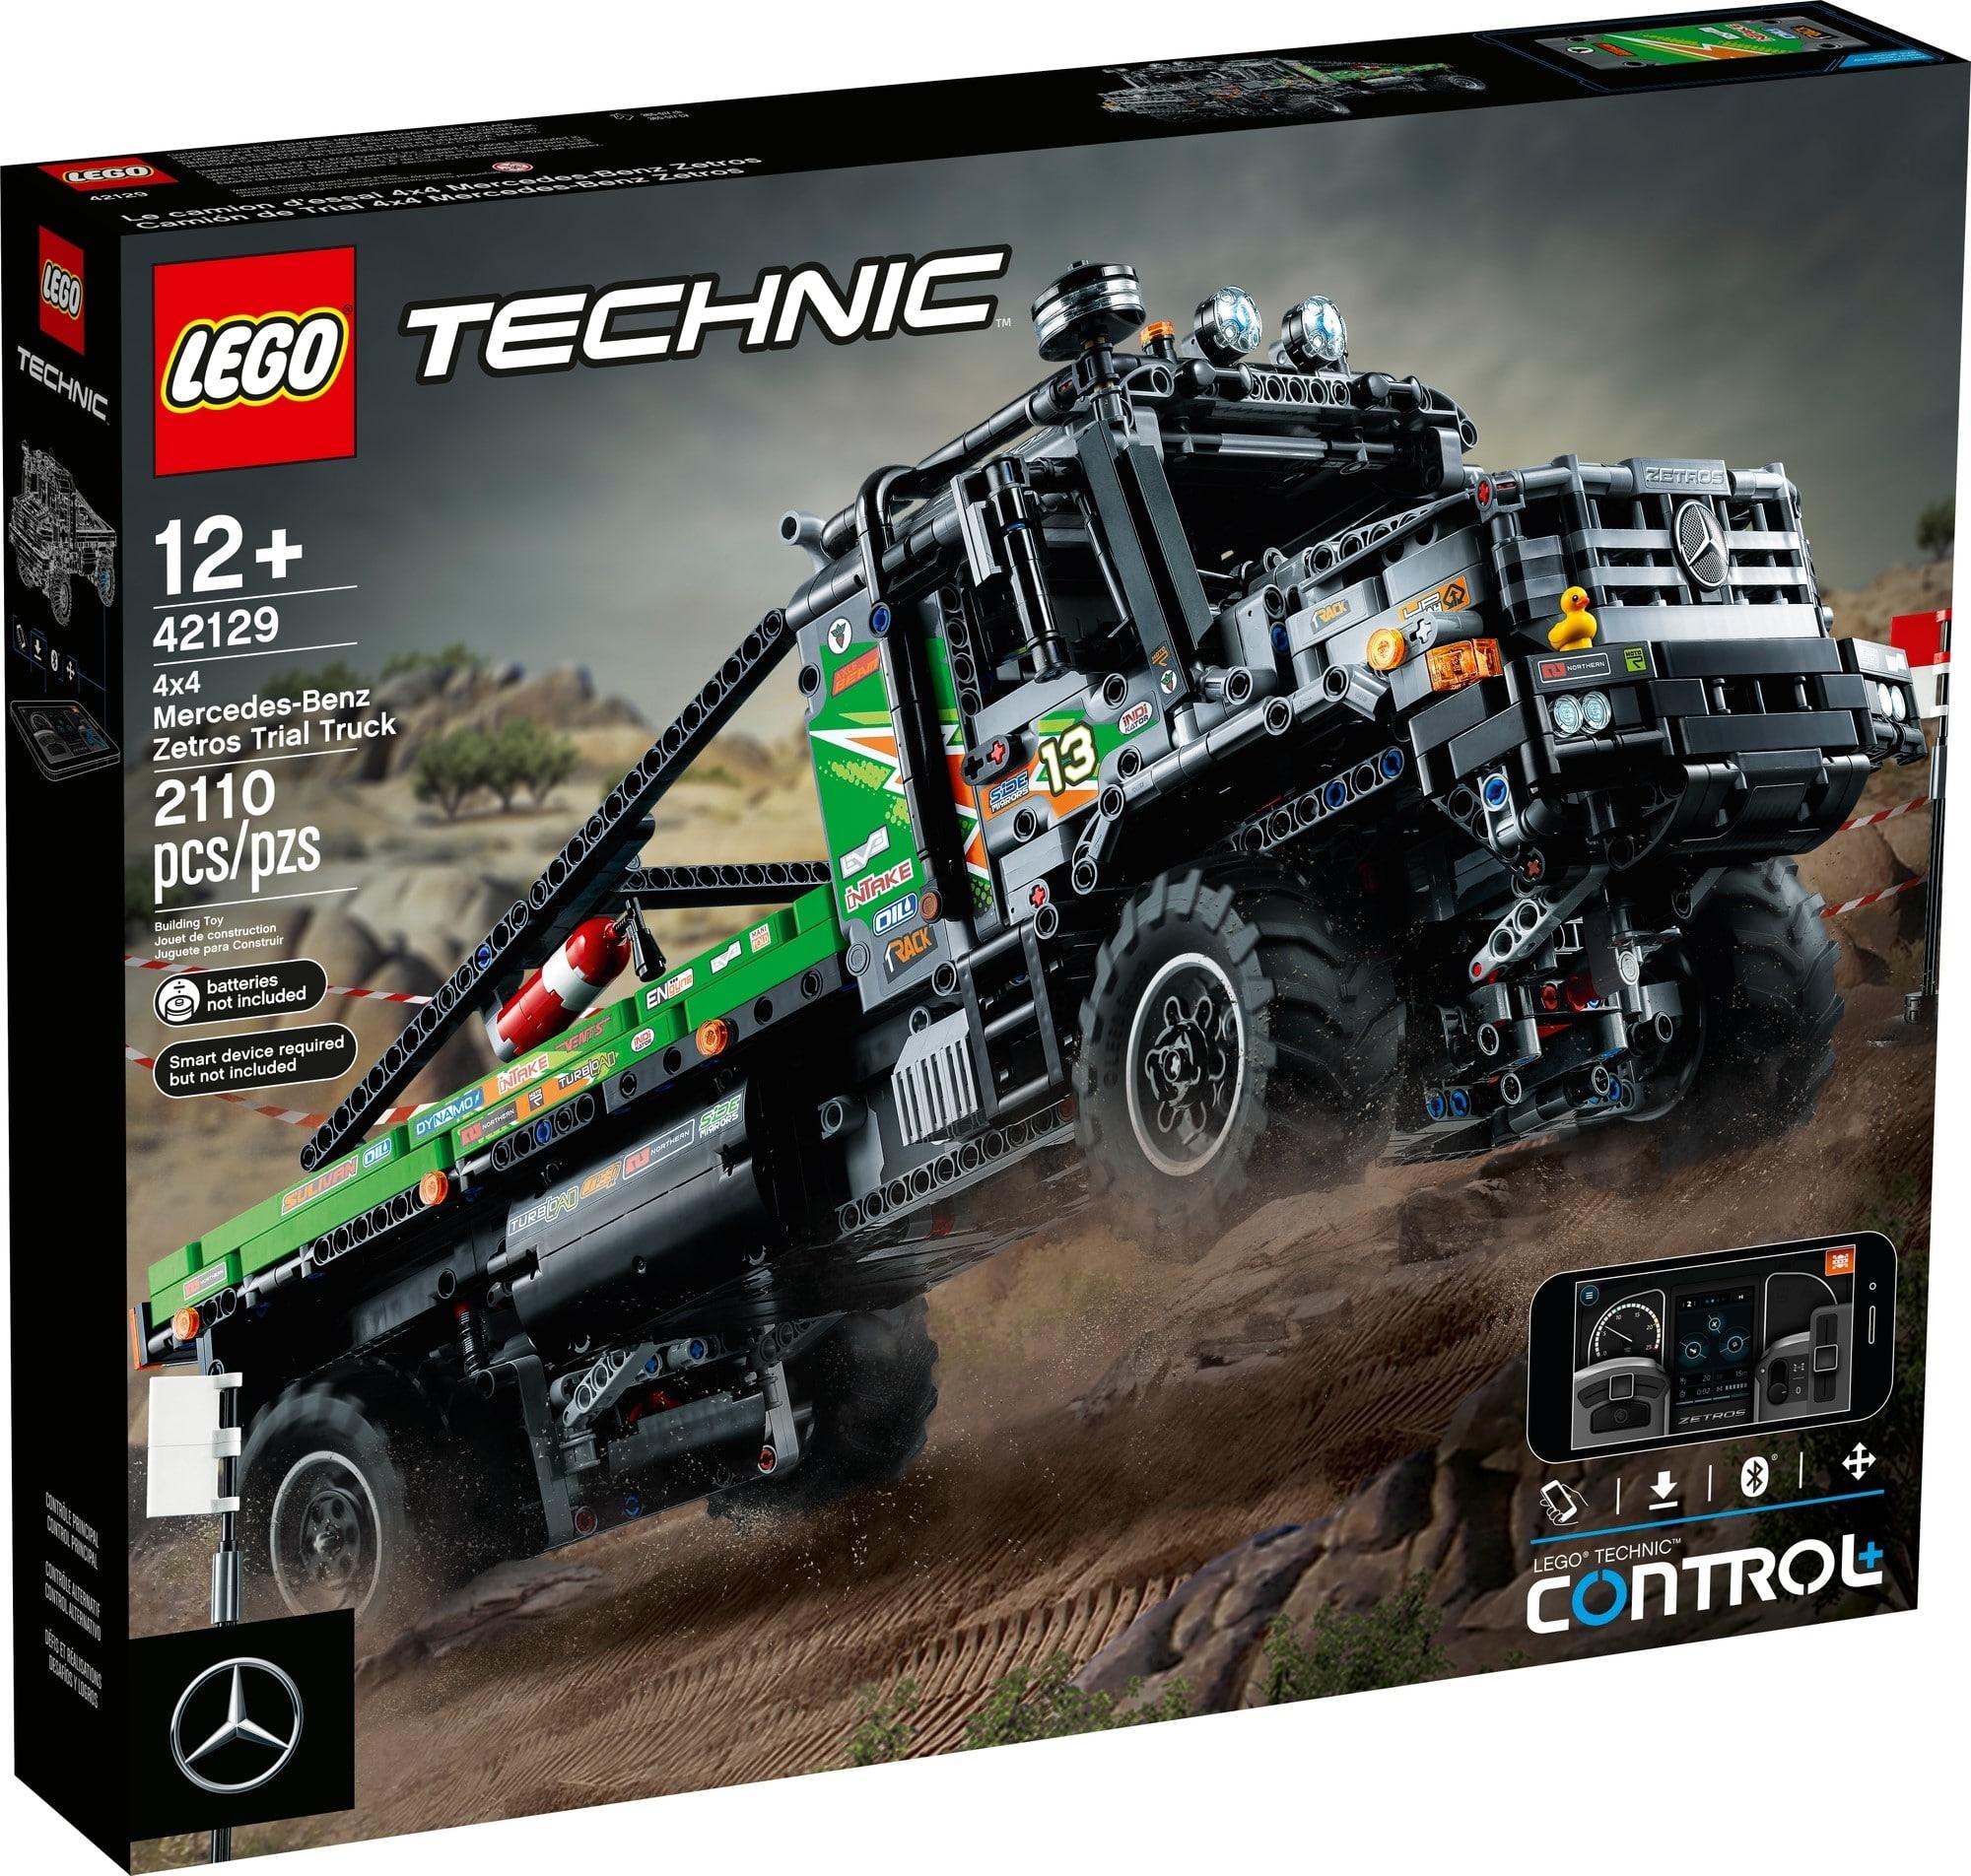 LEGO Technic 42129 4x4 Mercedes Benz Zetros Offroad Truck 2